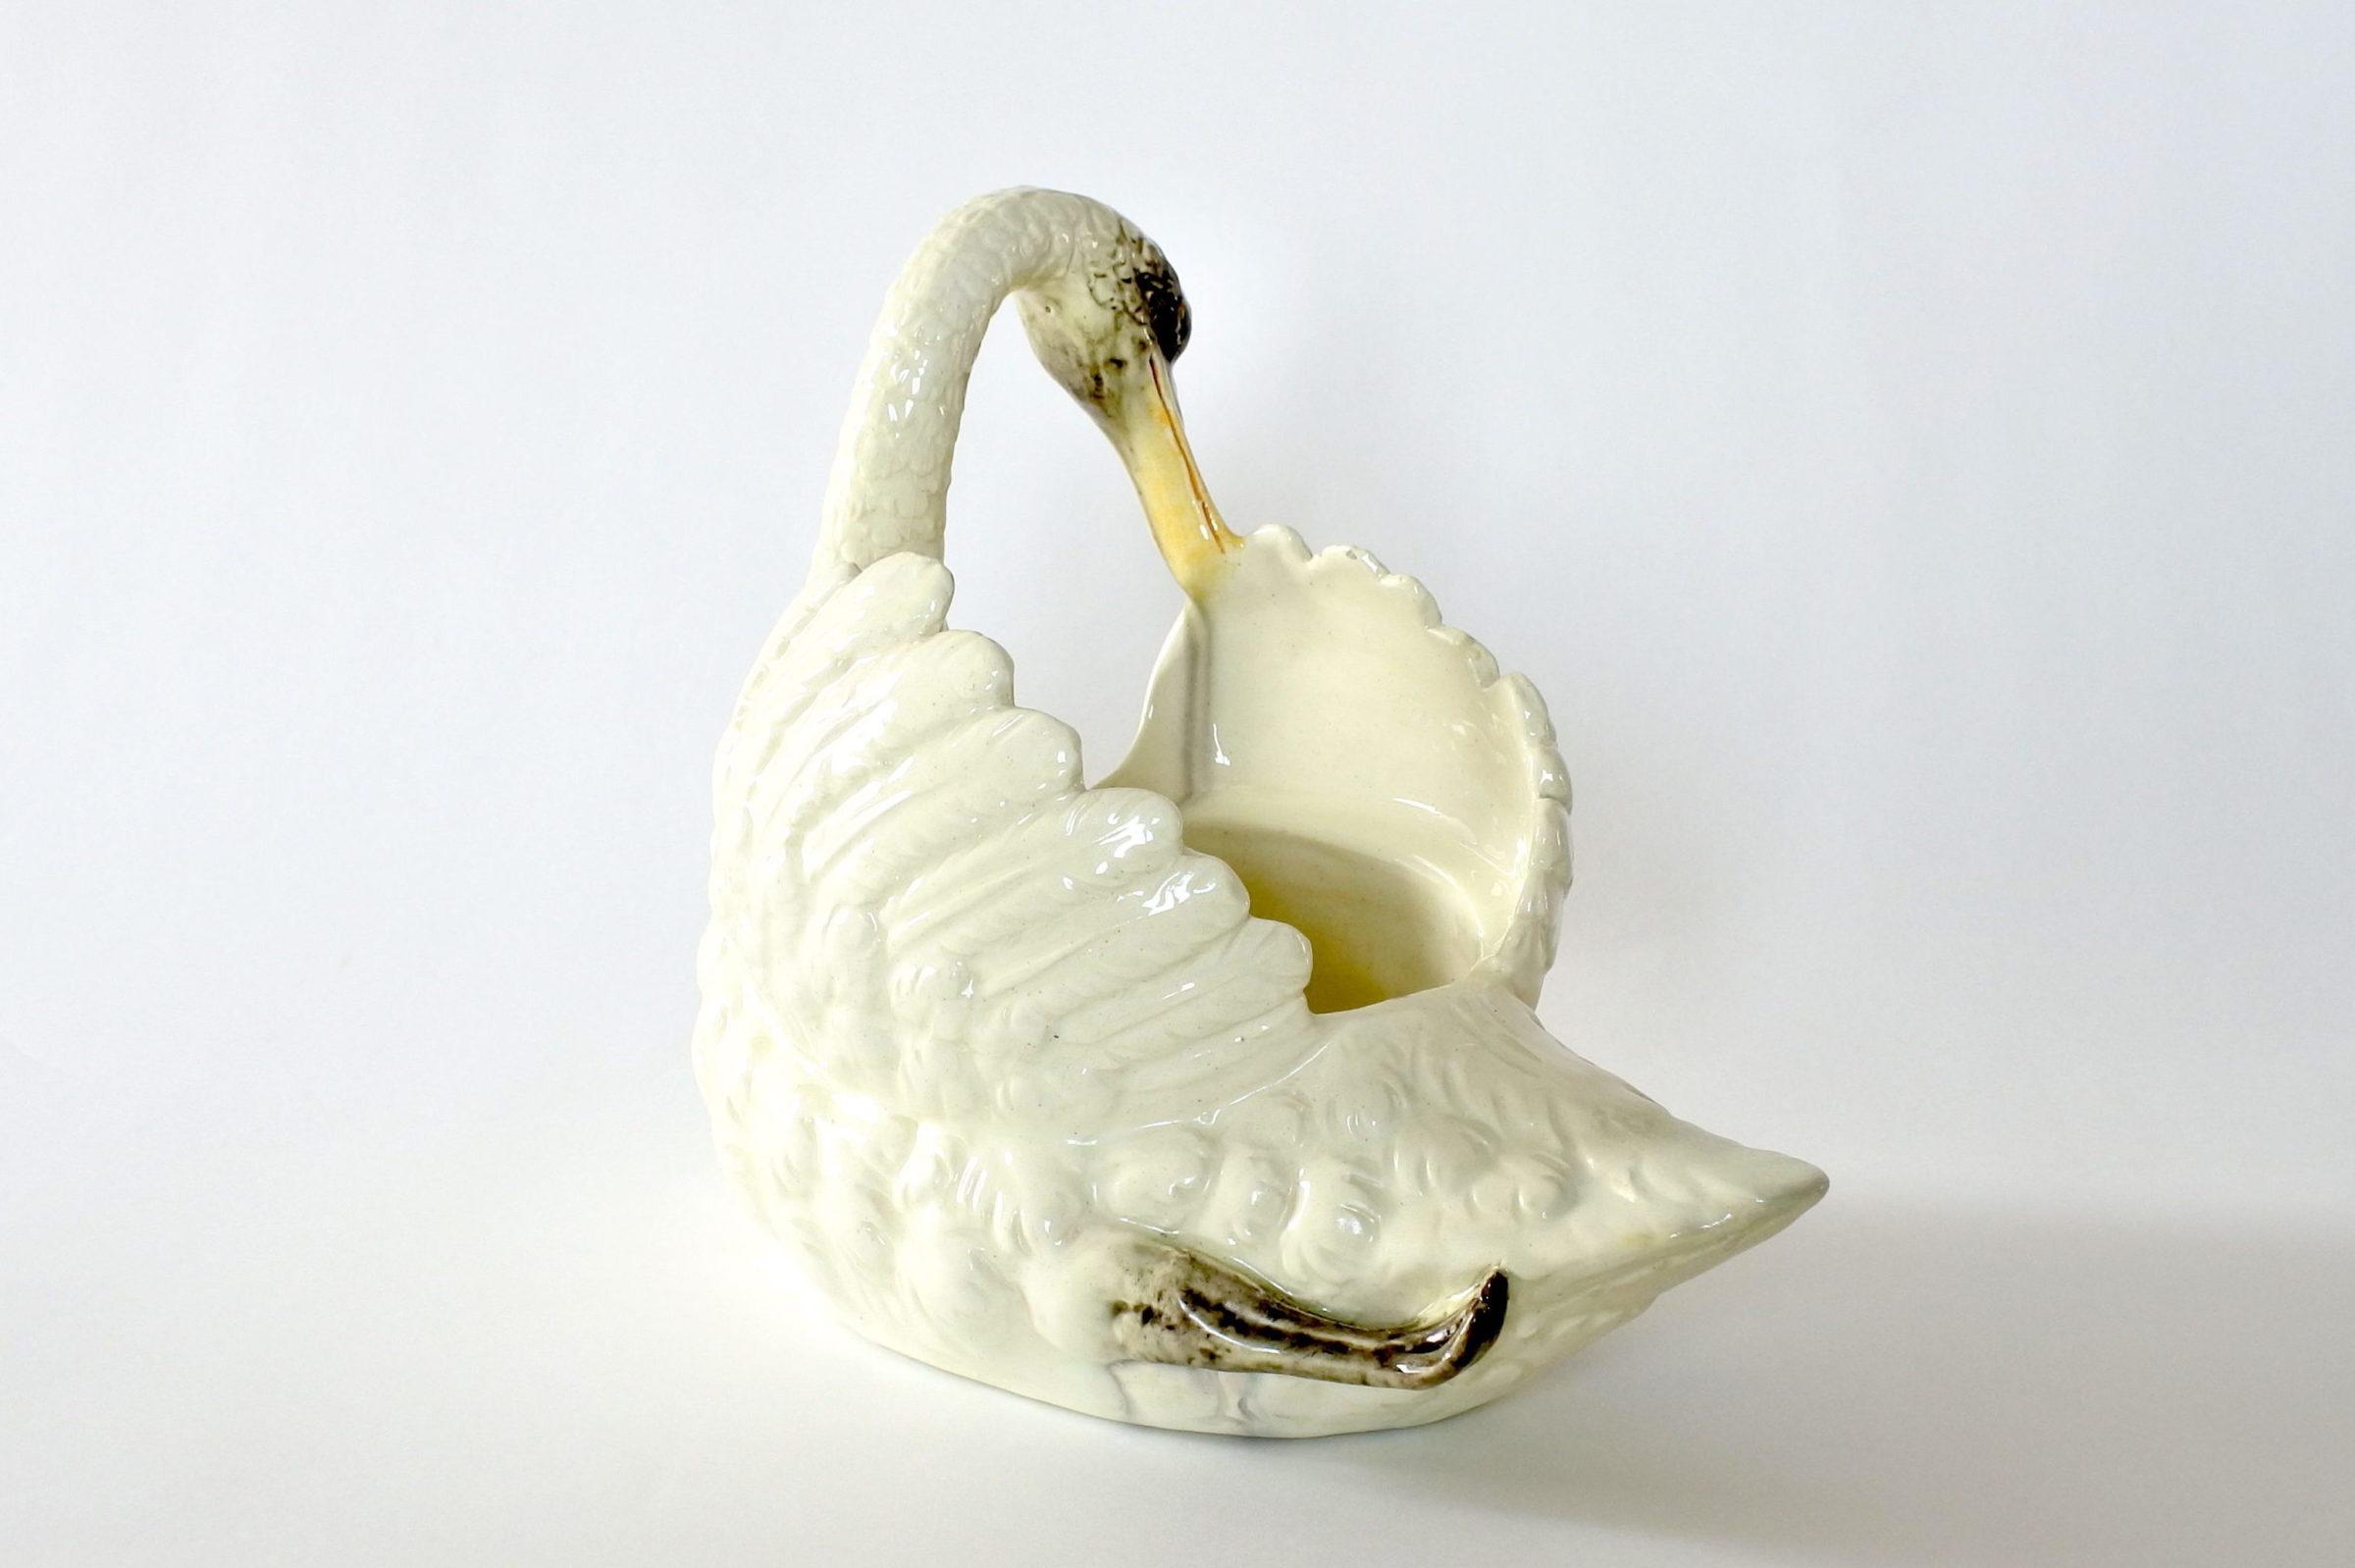 Cigno in ceramica barbotine con funzione di jardinière - Jérôme Massier Fils - 3